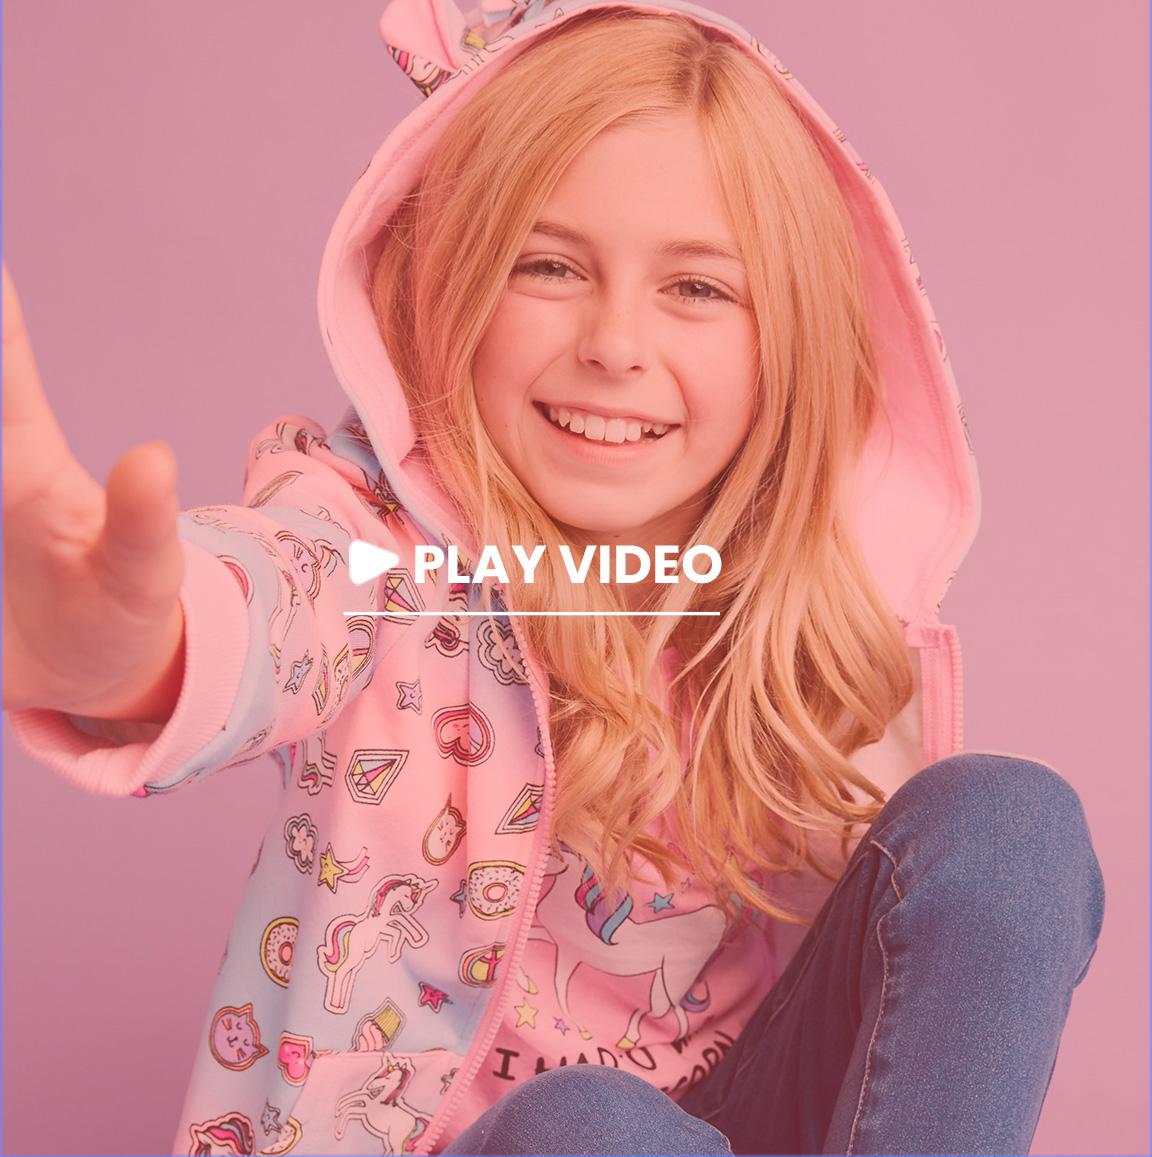 Play Video